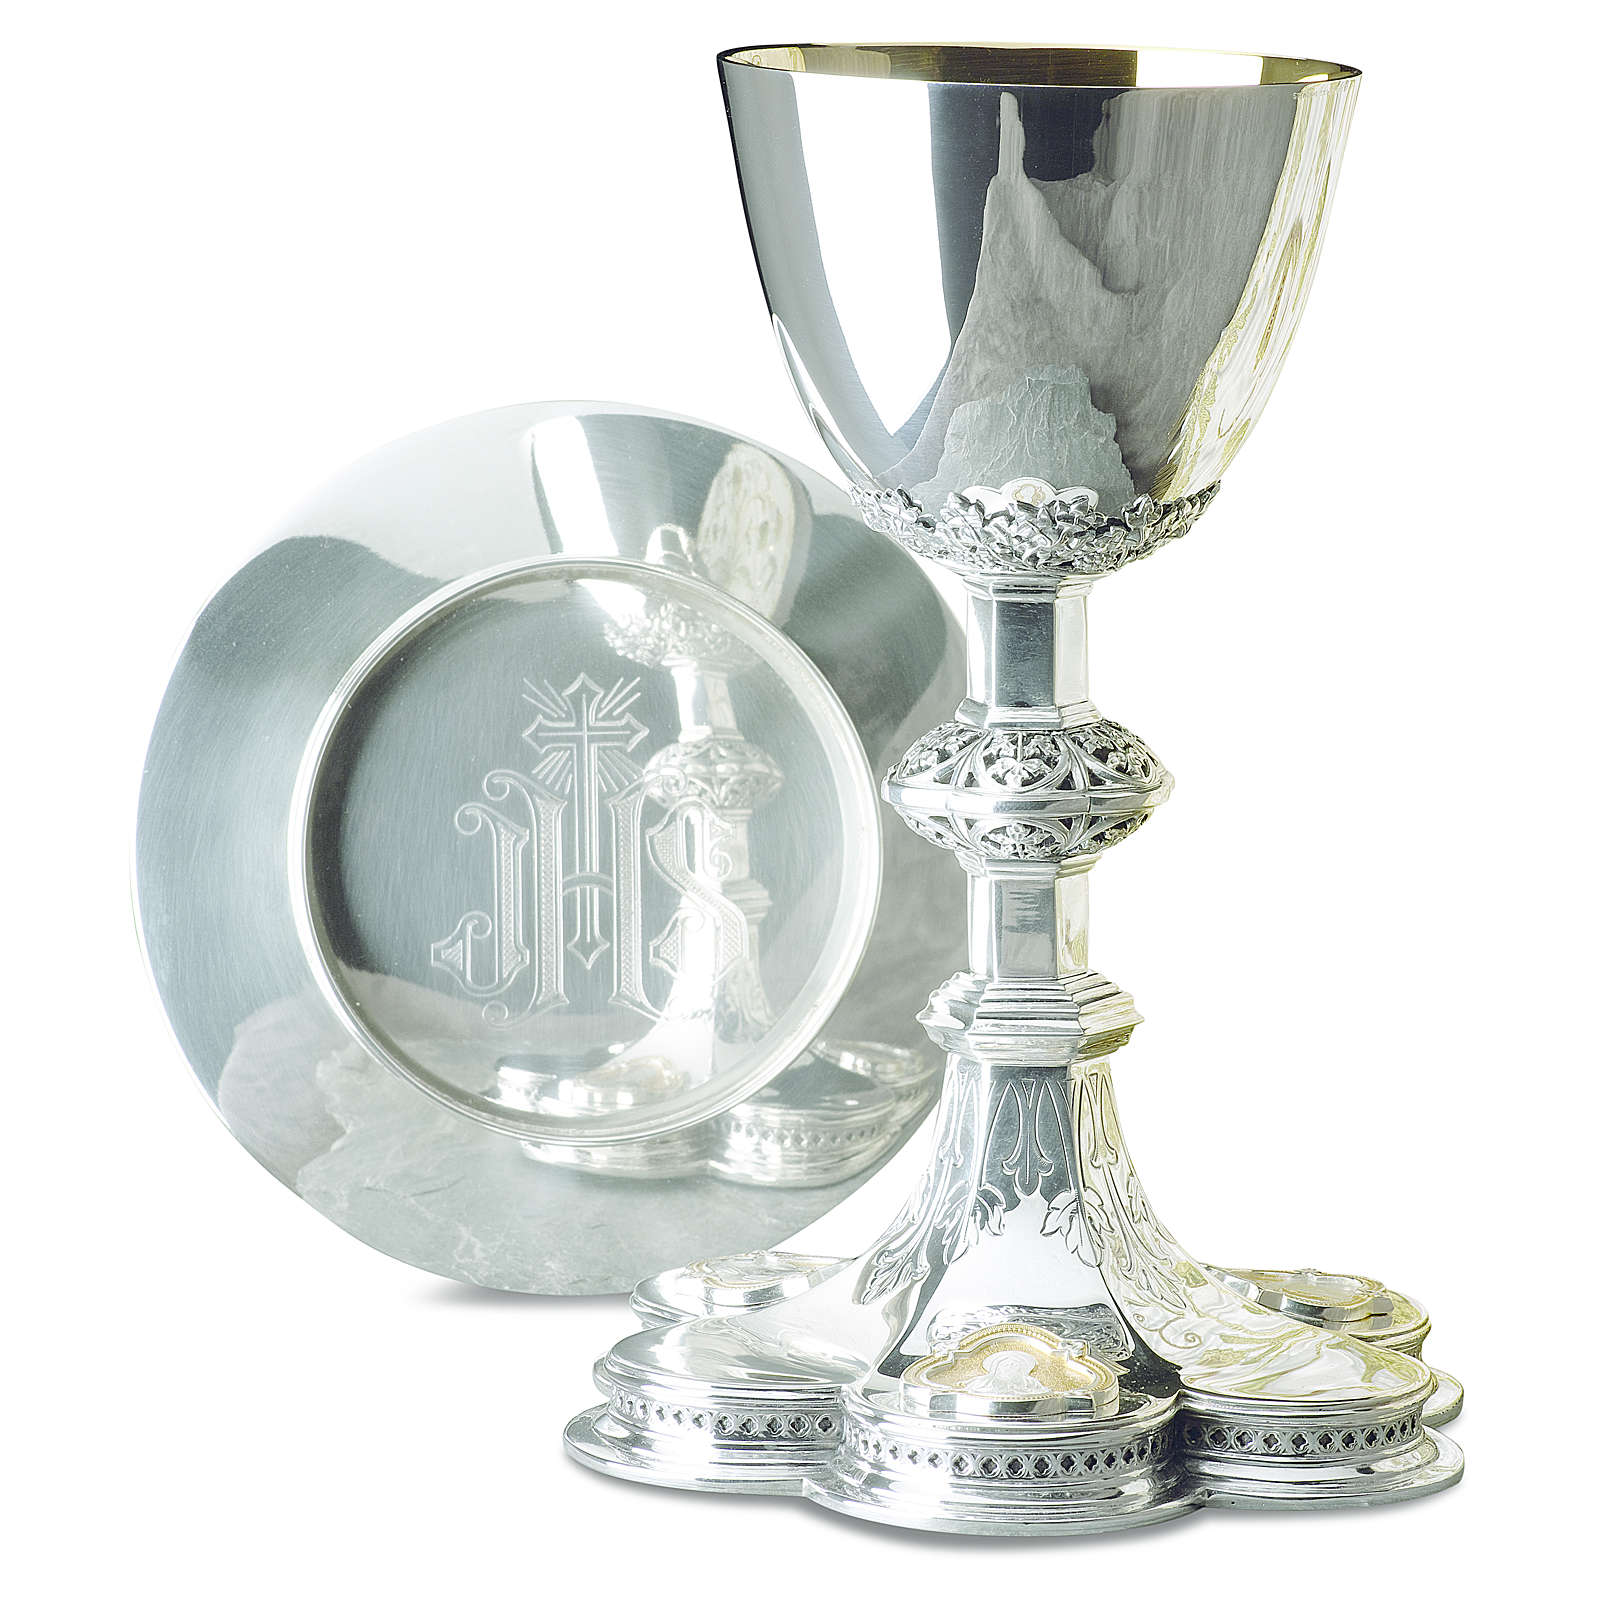 Calice patena Molina Gesù Maria Giuseppe coppa argento 925 4